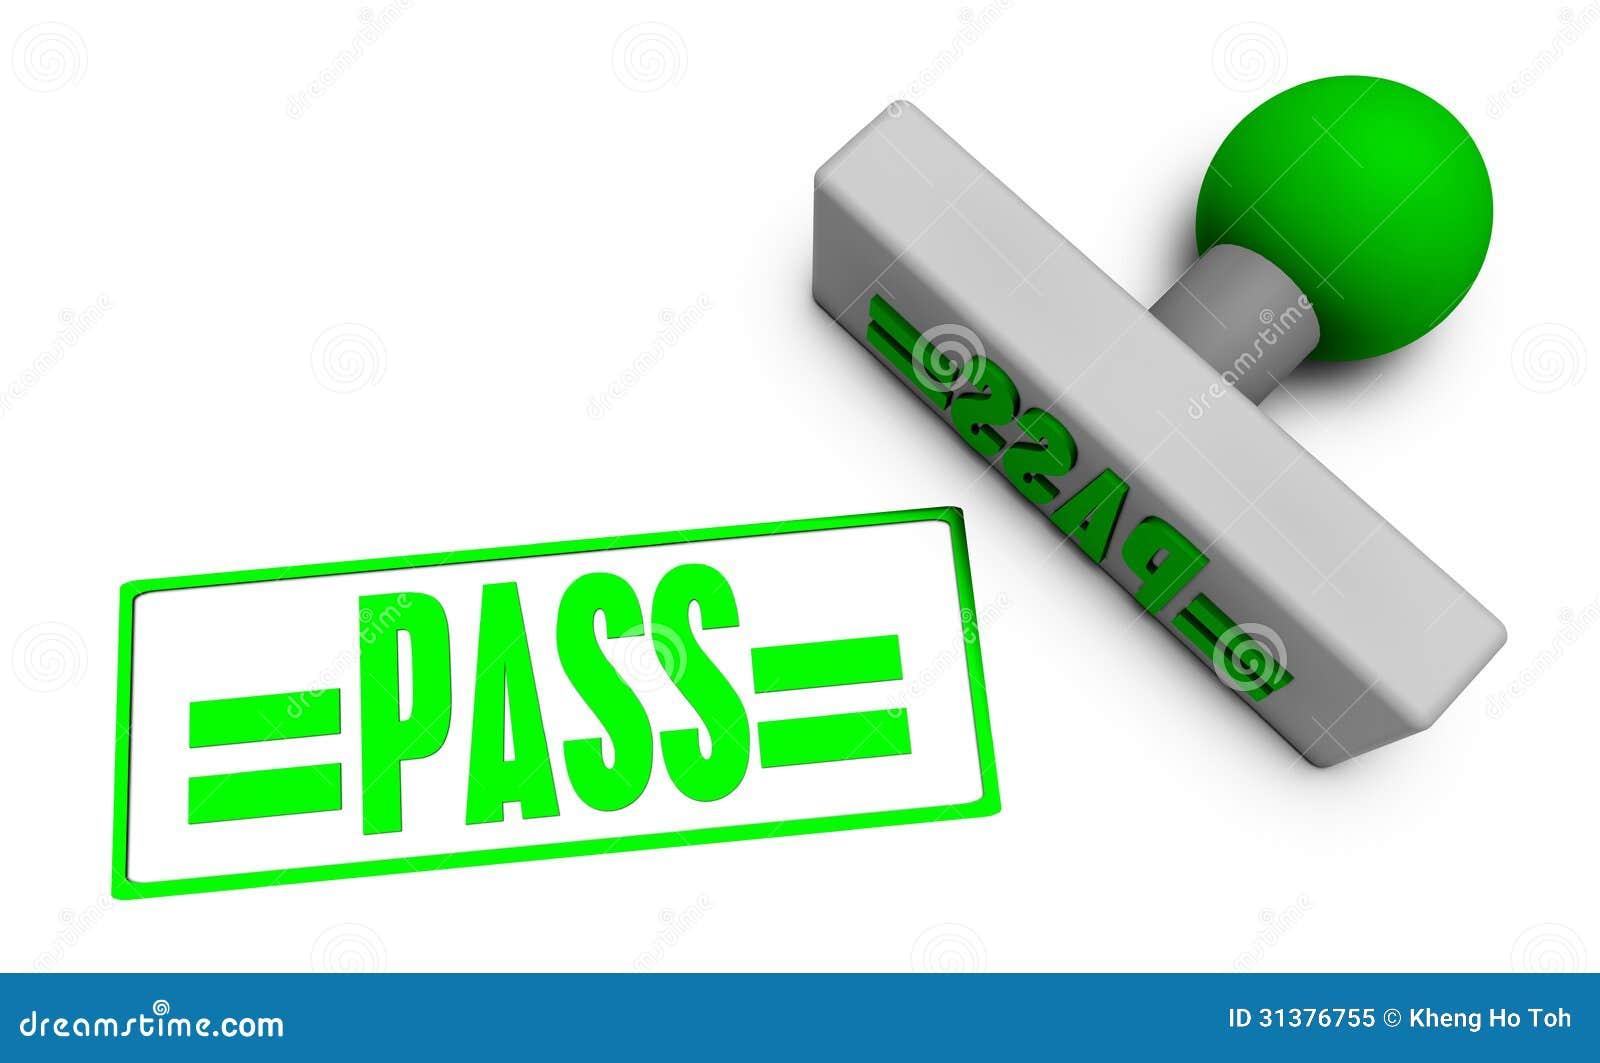 Pass Stamp Royalty Free Stock Photo Image 31376755